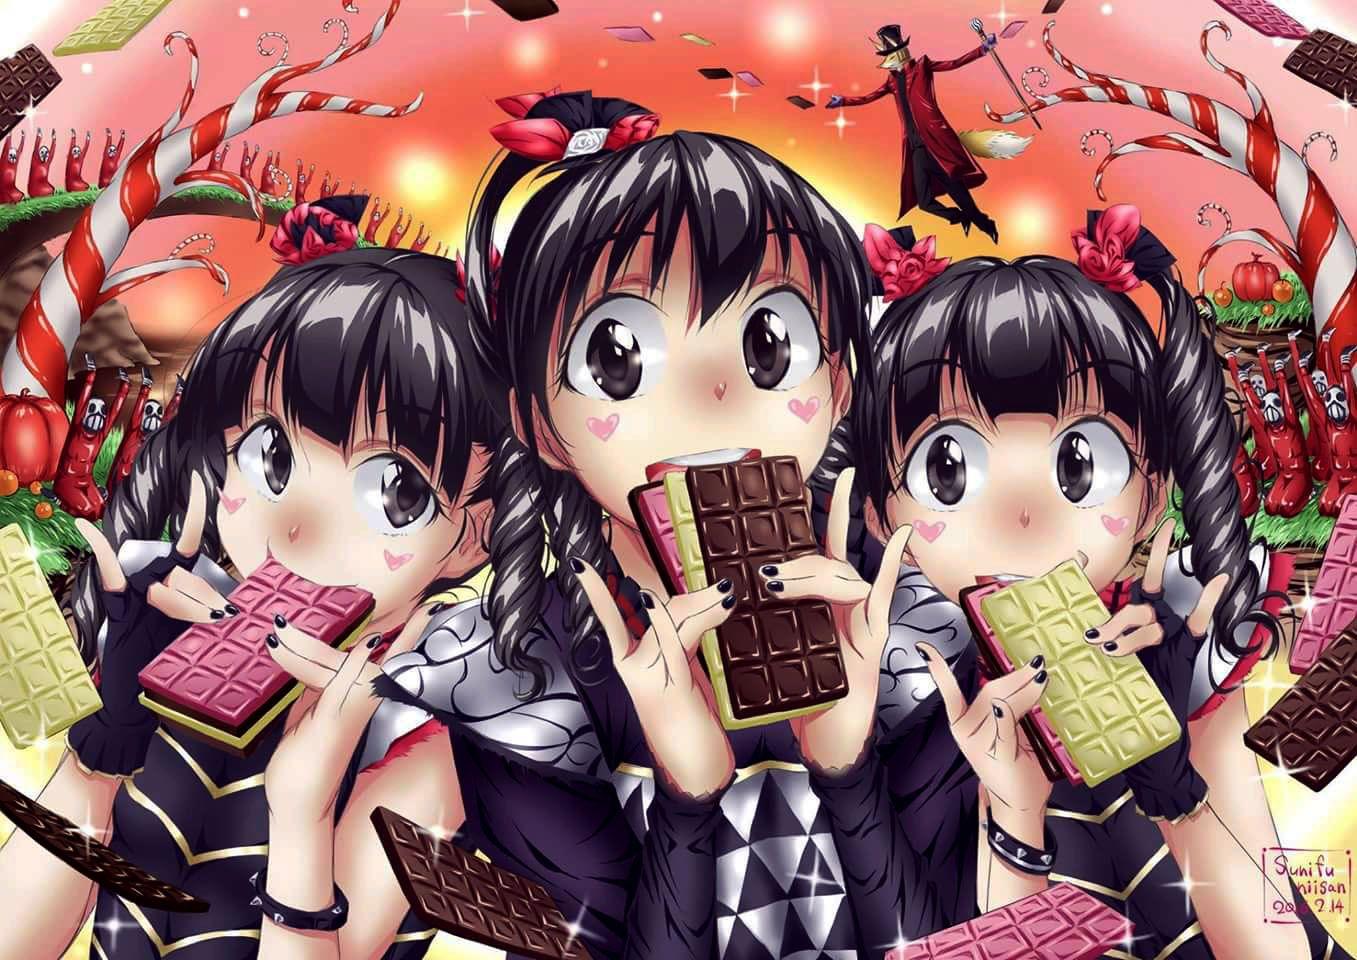 Gimme Chocolate By Sunifu Niisan 2016-02-14 #Babymetal - #YuiMetal ...